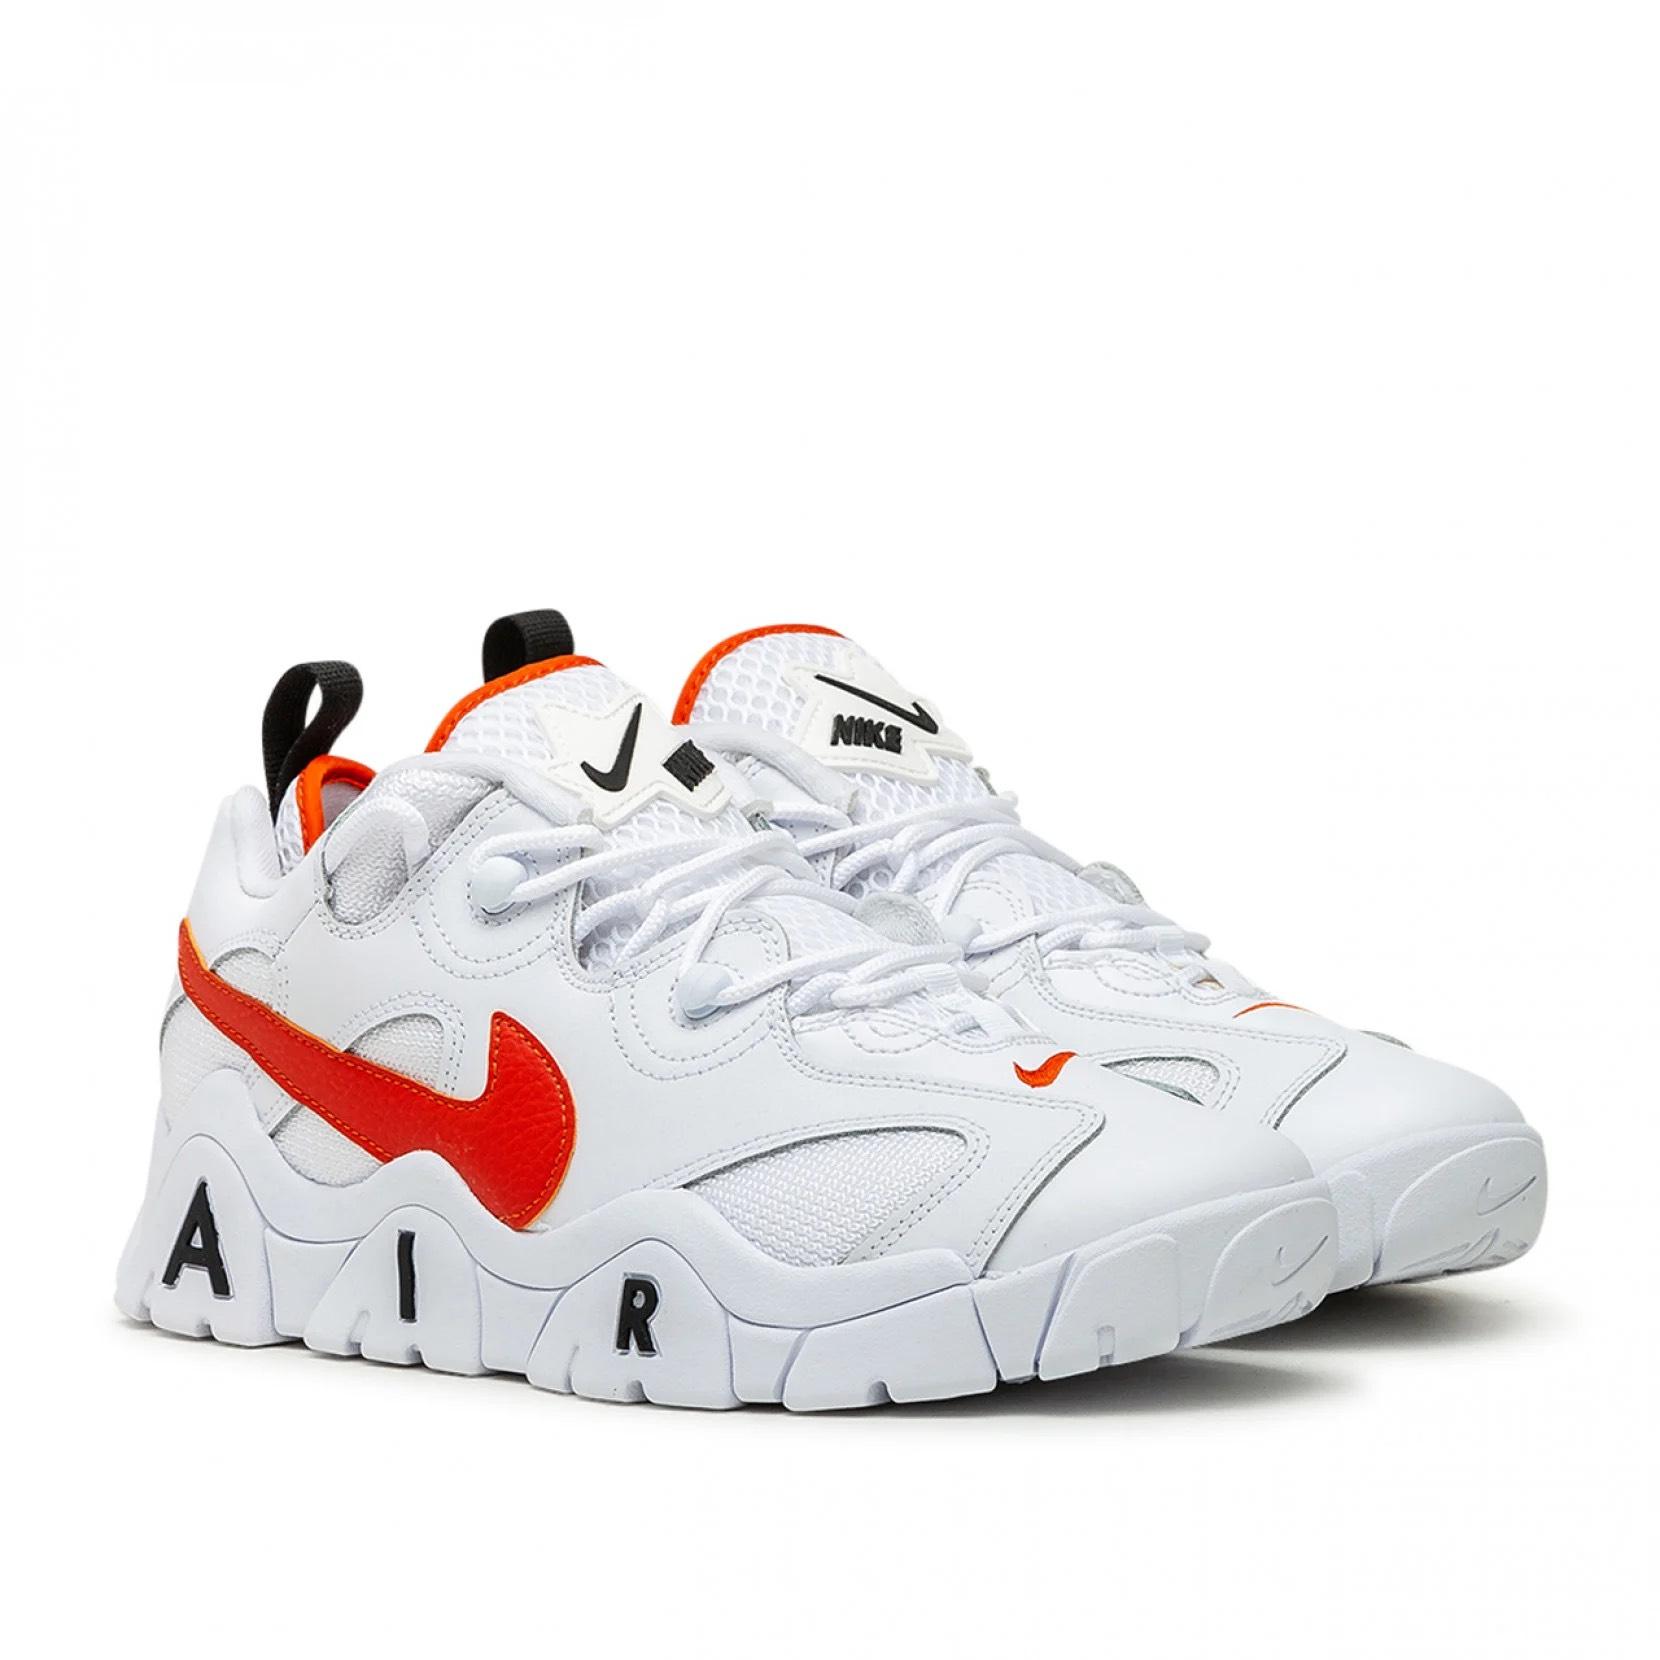 [Allike] Nike Air Barrage Low 74,88€ Gr. 40-47,5 + 49,5